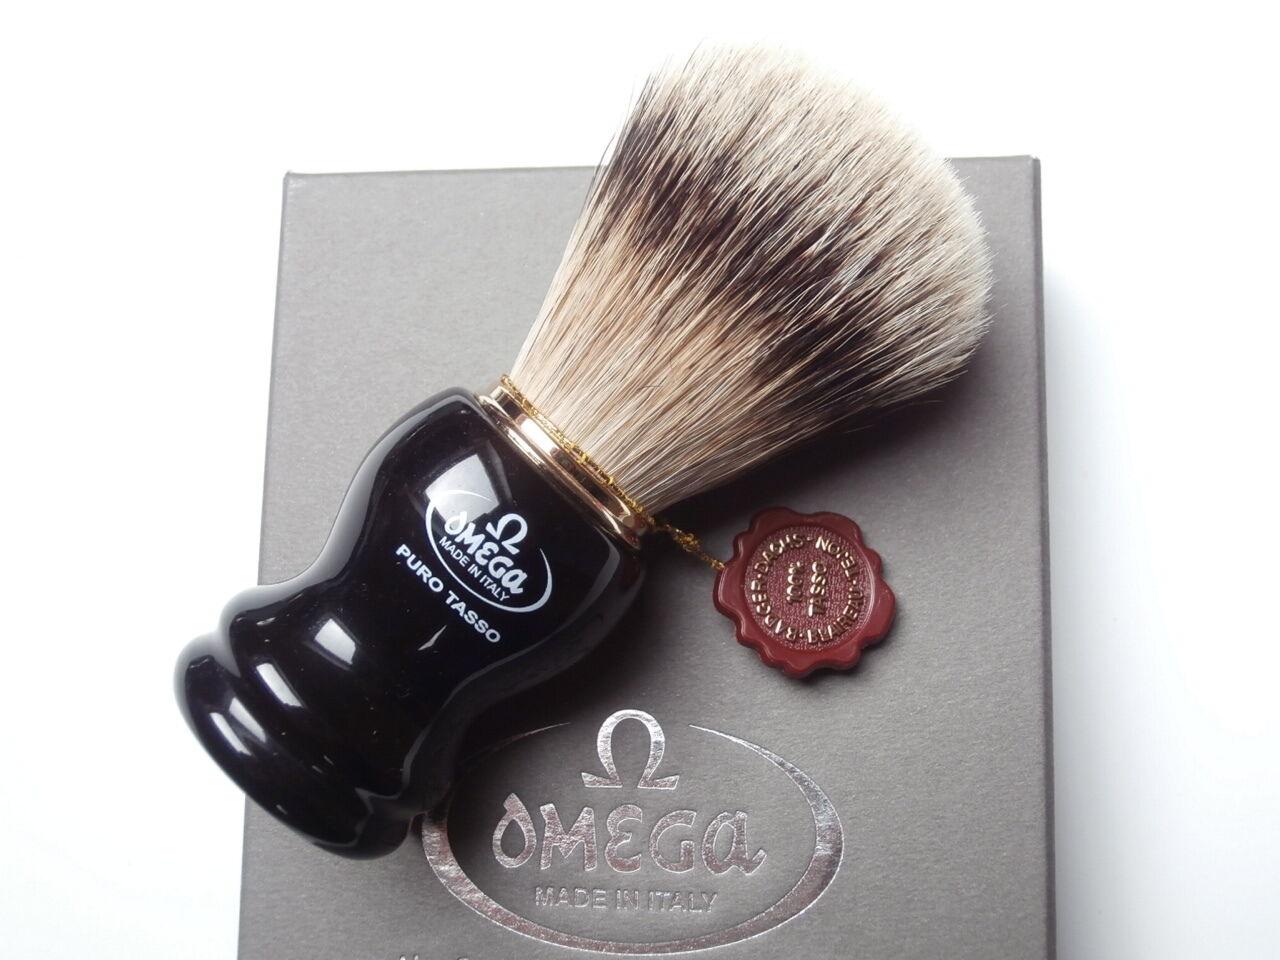 TOP Rasierpinsel OMEGA Dachs Bester SILBERSPITZ Shaving brush Silvertip !!